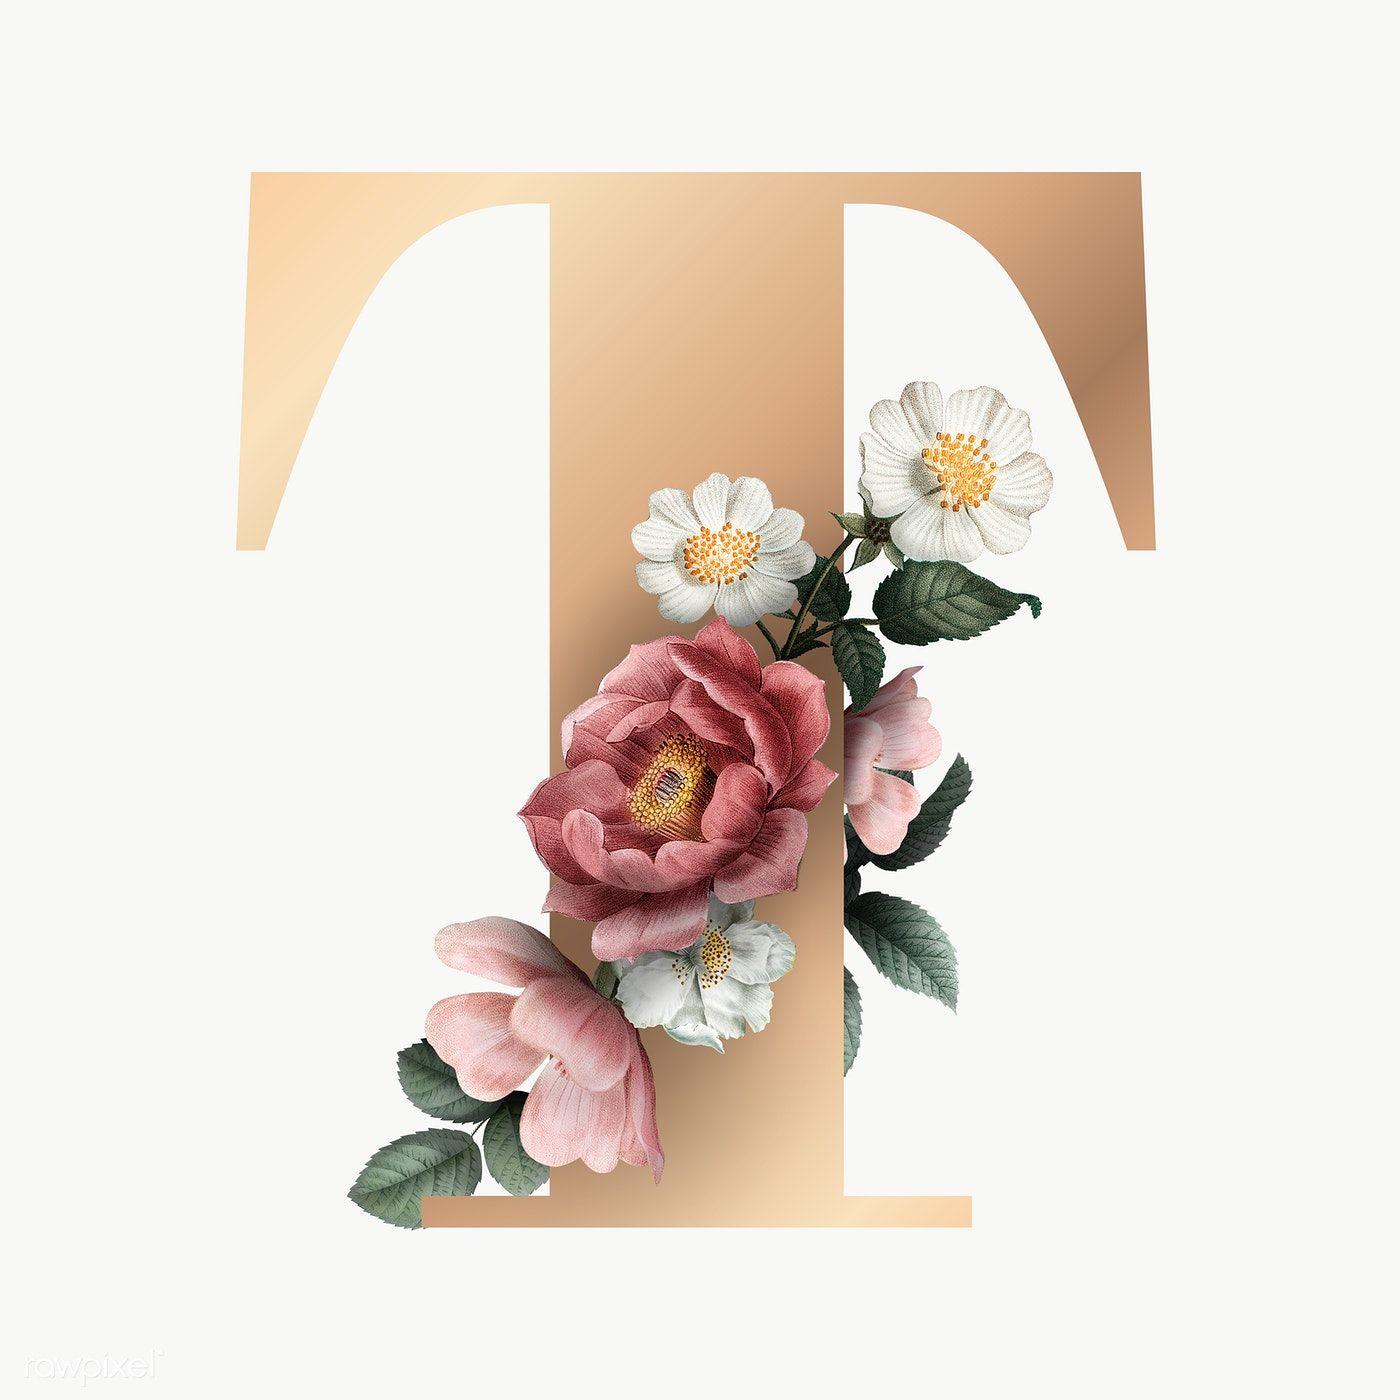 Classic And Elegant Floral Alphabet Font Letter T Transparent Png Free Image By Rawpixel Com Floral Monogram Letter Fonts Alphabet Lettering Alphabet Fonts